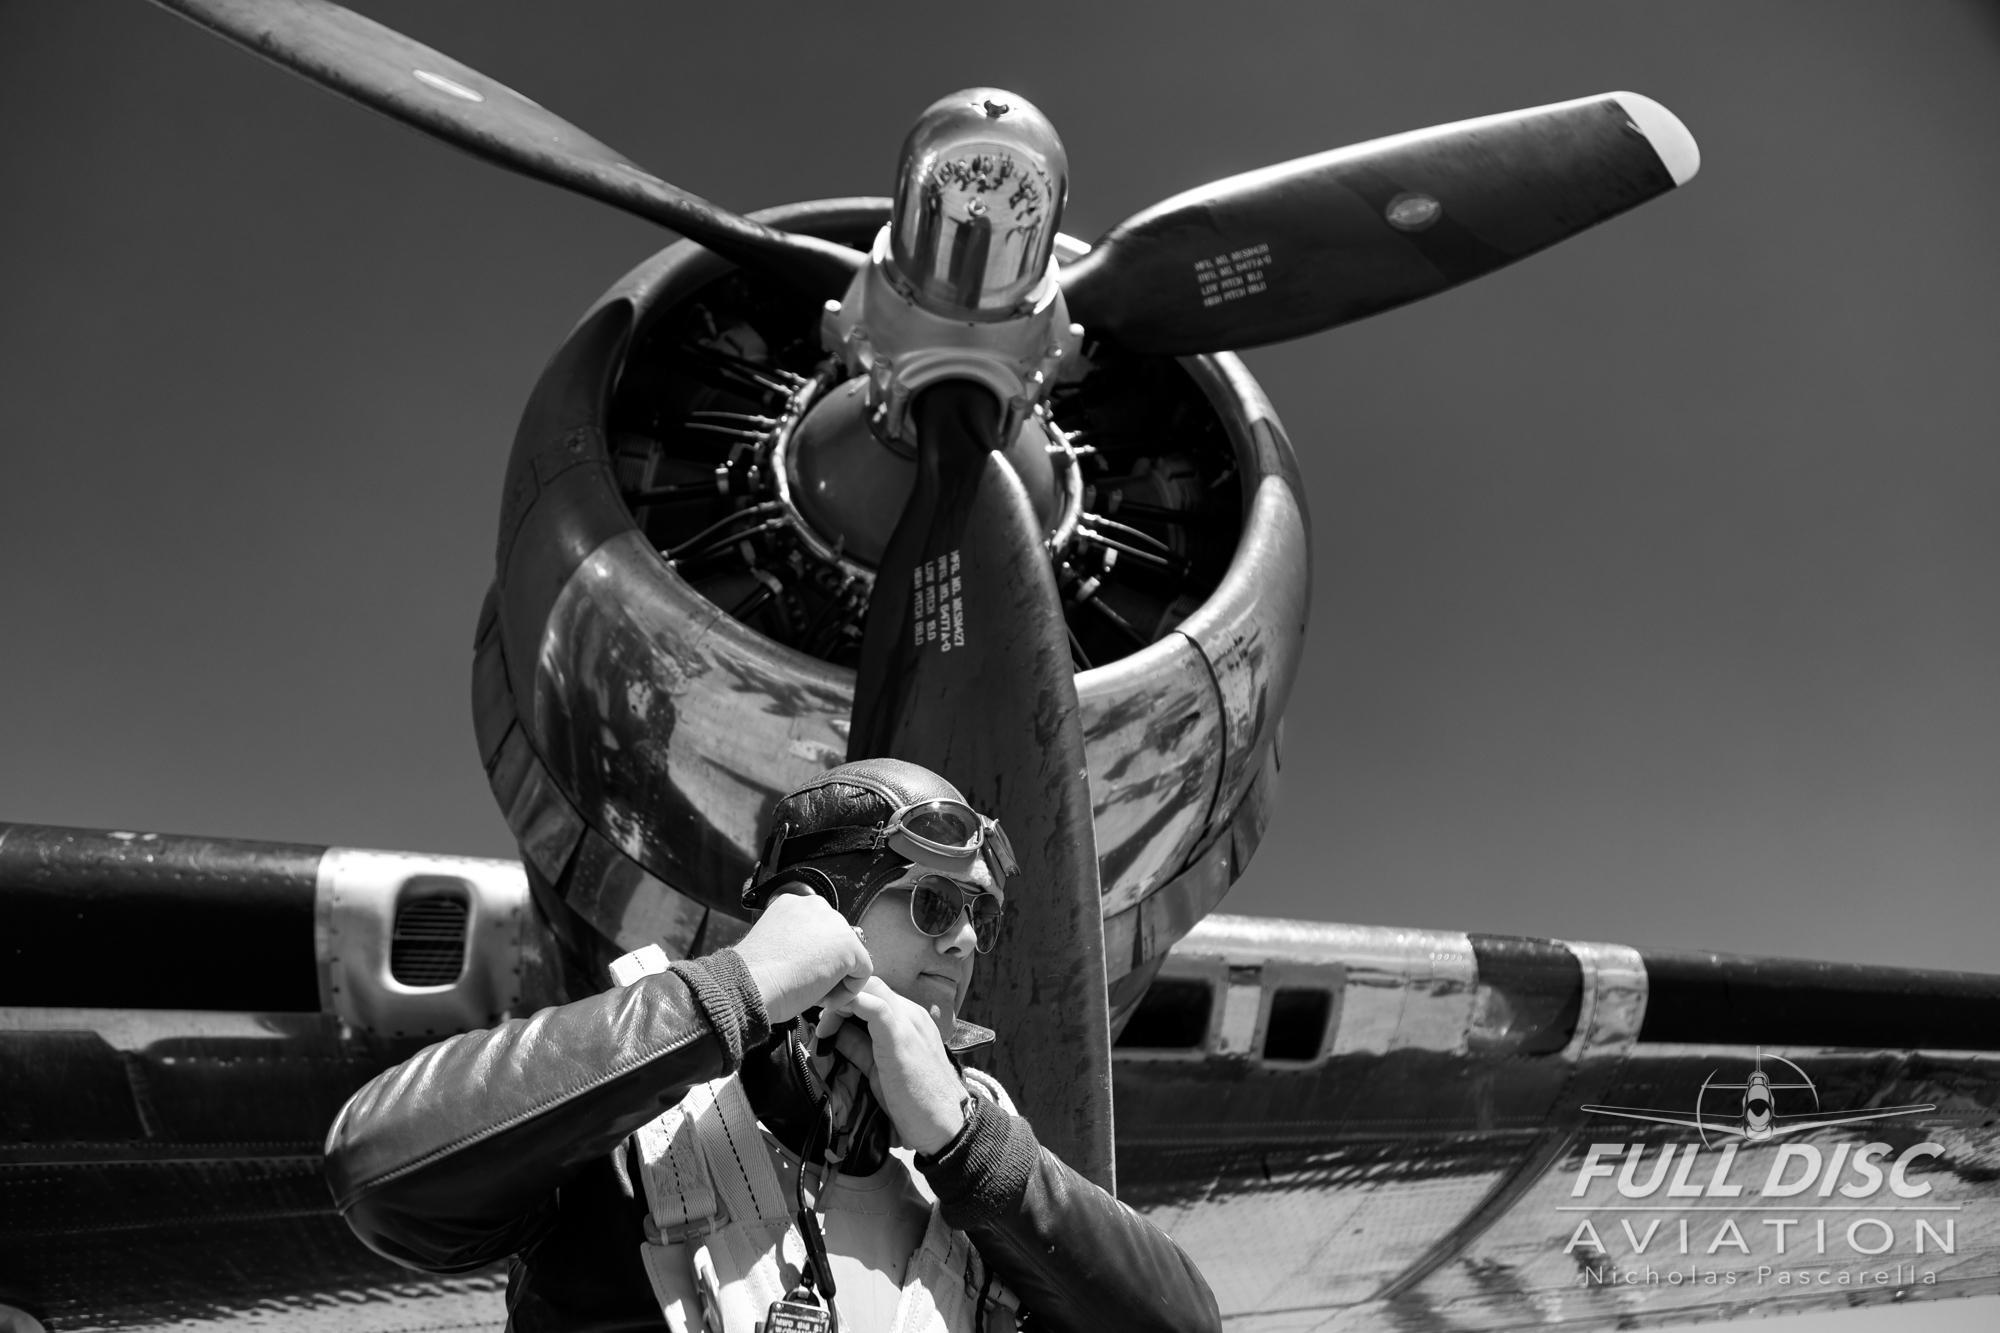 americanairpowermuseum_nicholaspascarella_nickpascarella_fulldiscaviation_legendsofairpower2019_aviation_warbird_reenactor_b17crew.jpg